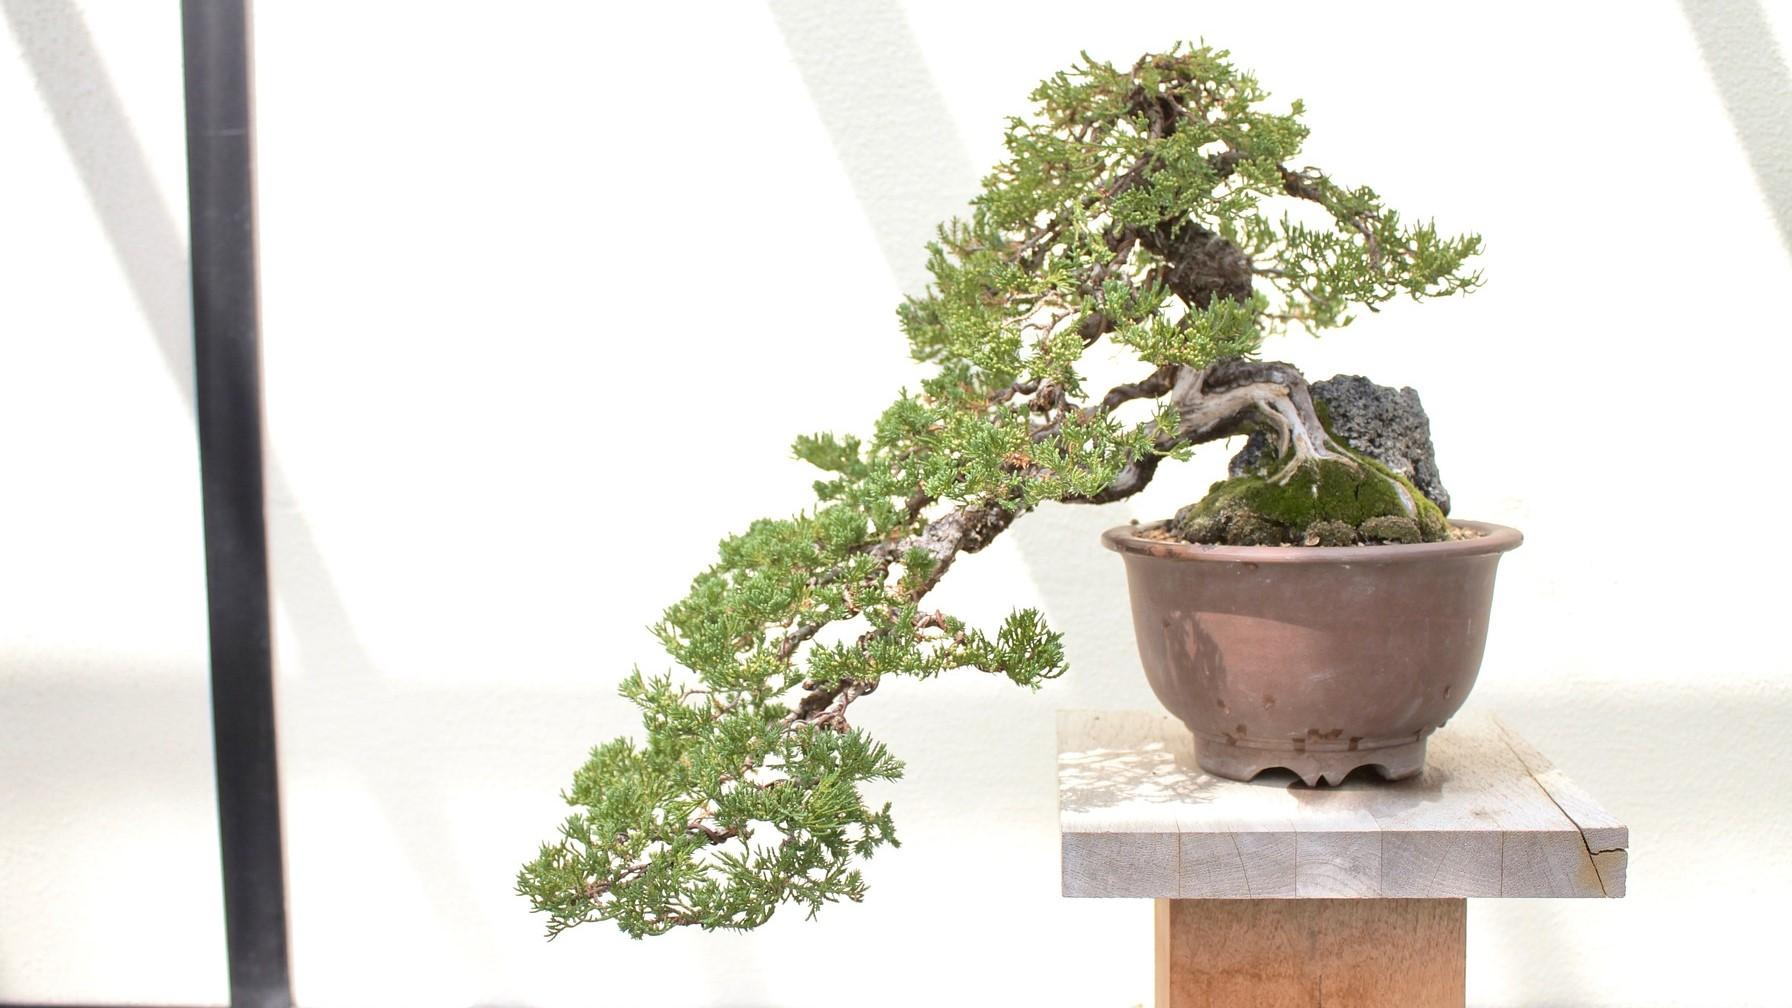 Image: Large bonsai